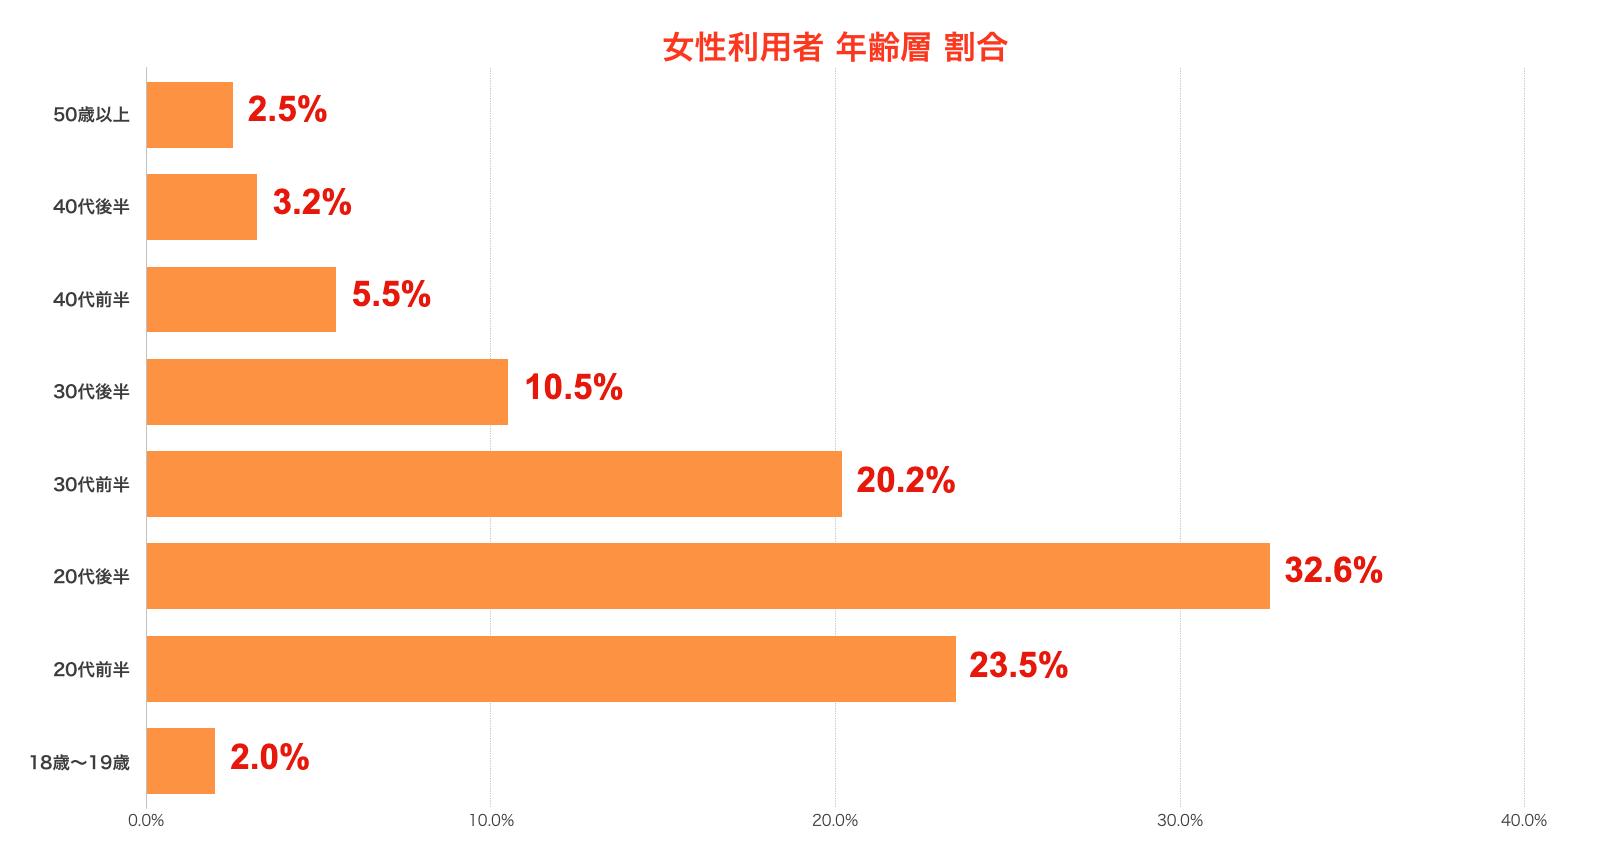 ペアーズ(Pairs)女性利用者 年齢層割合